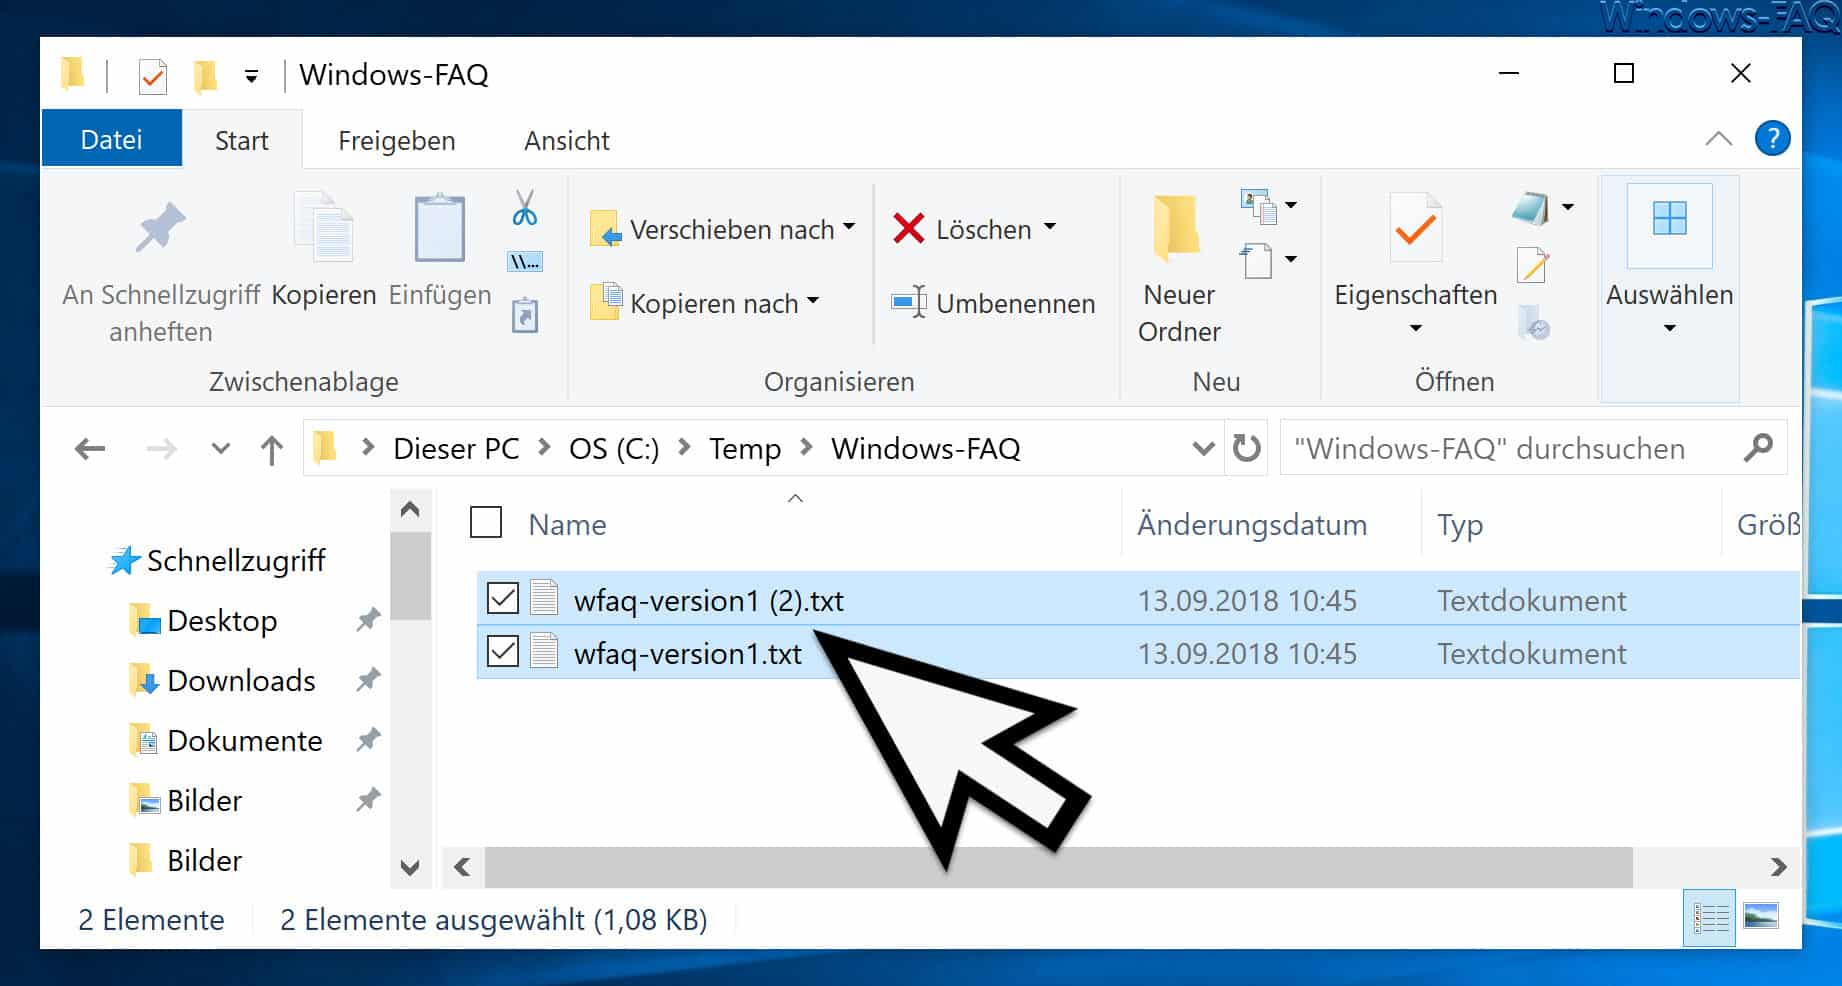 Beide Dateien erhalten beim Kopiervorgang